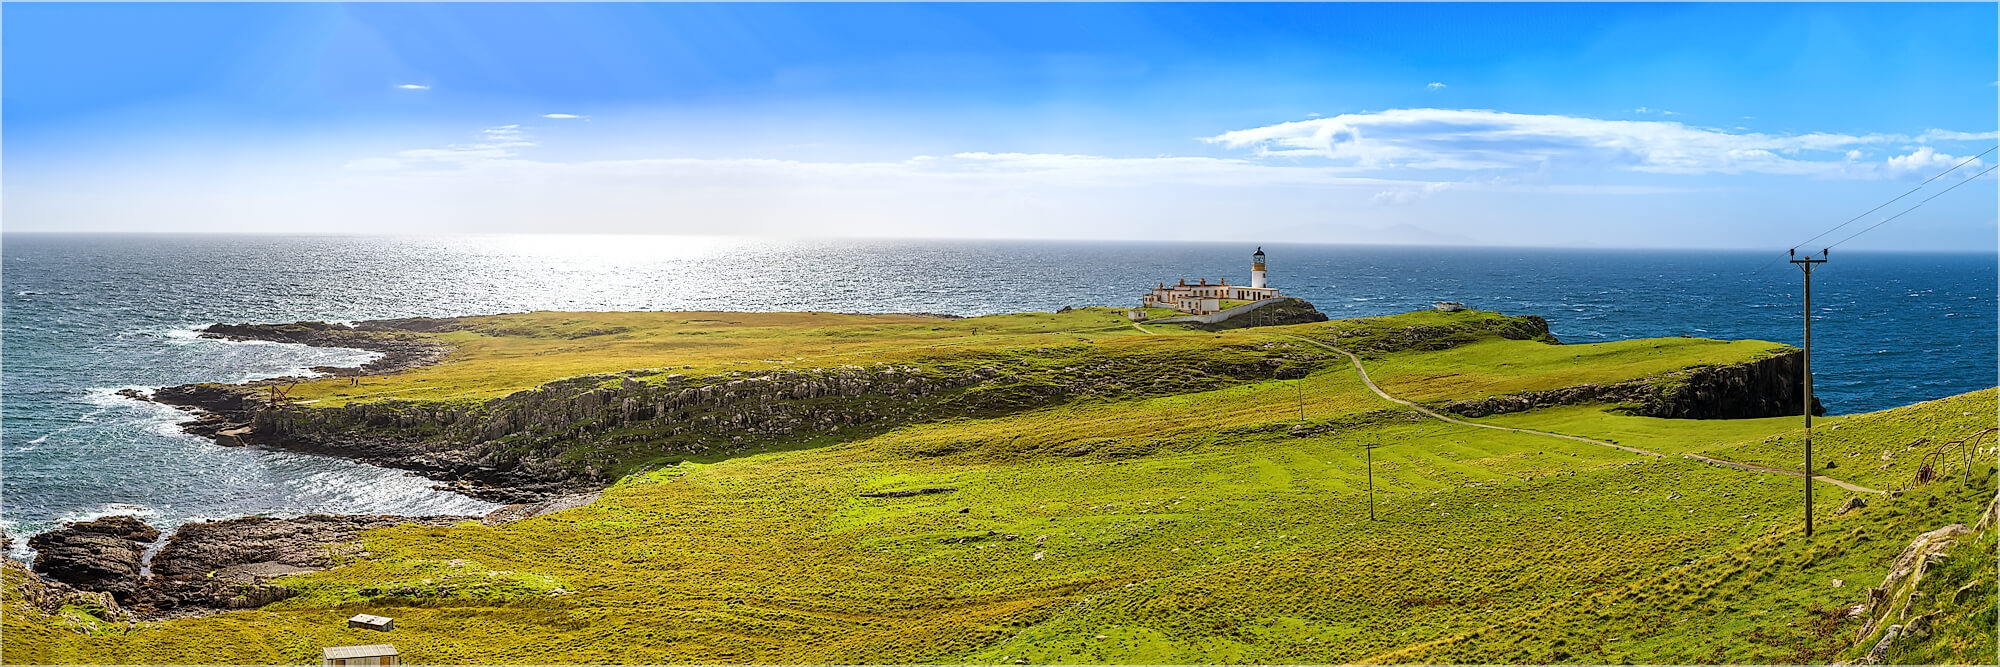 Panoramafoto Schottland Isle of Skye am Nest Point